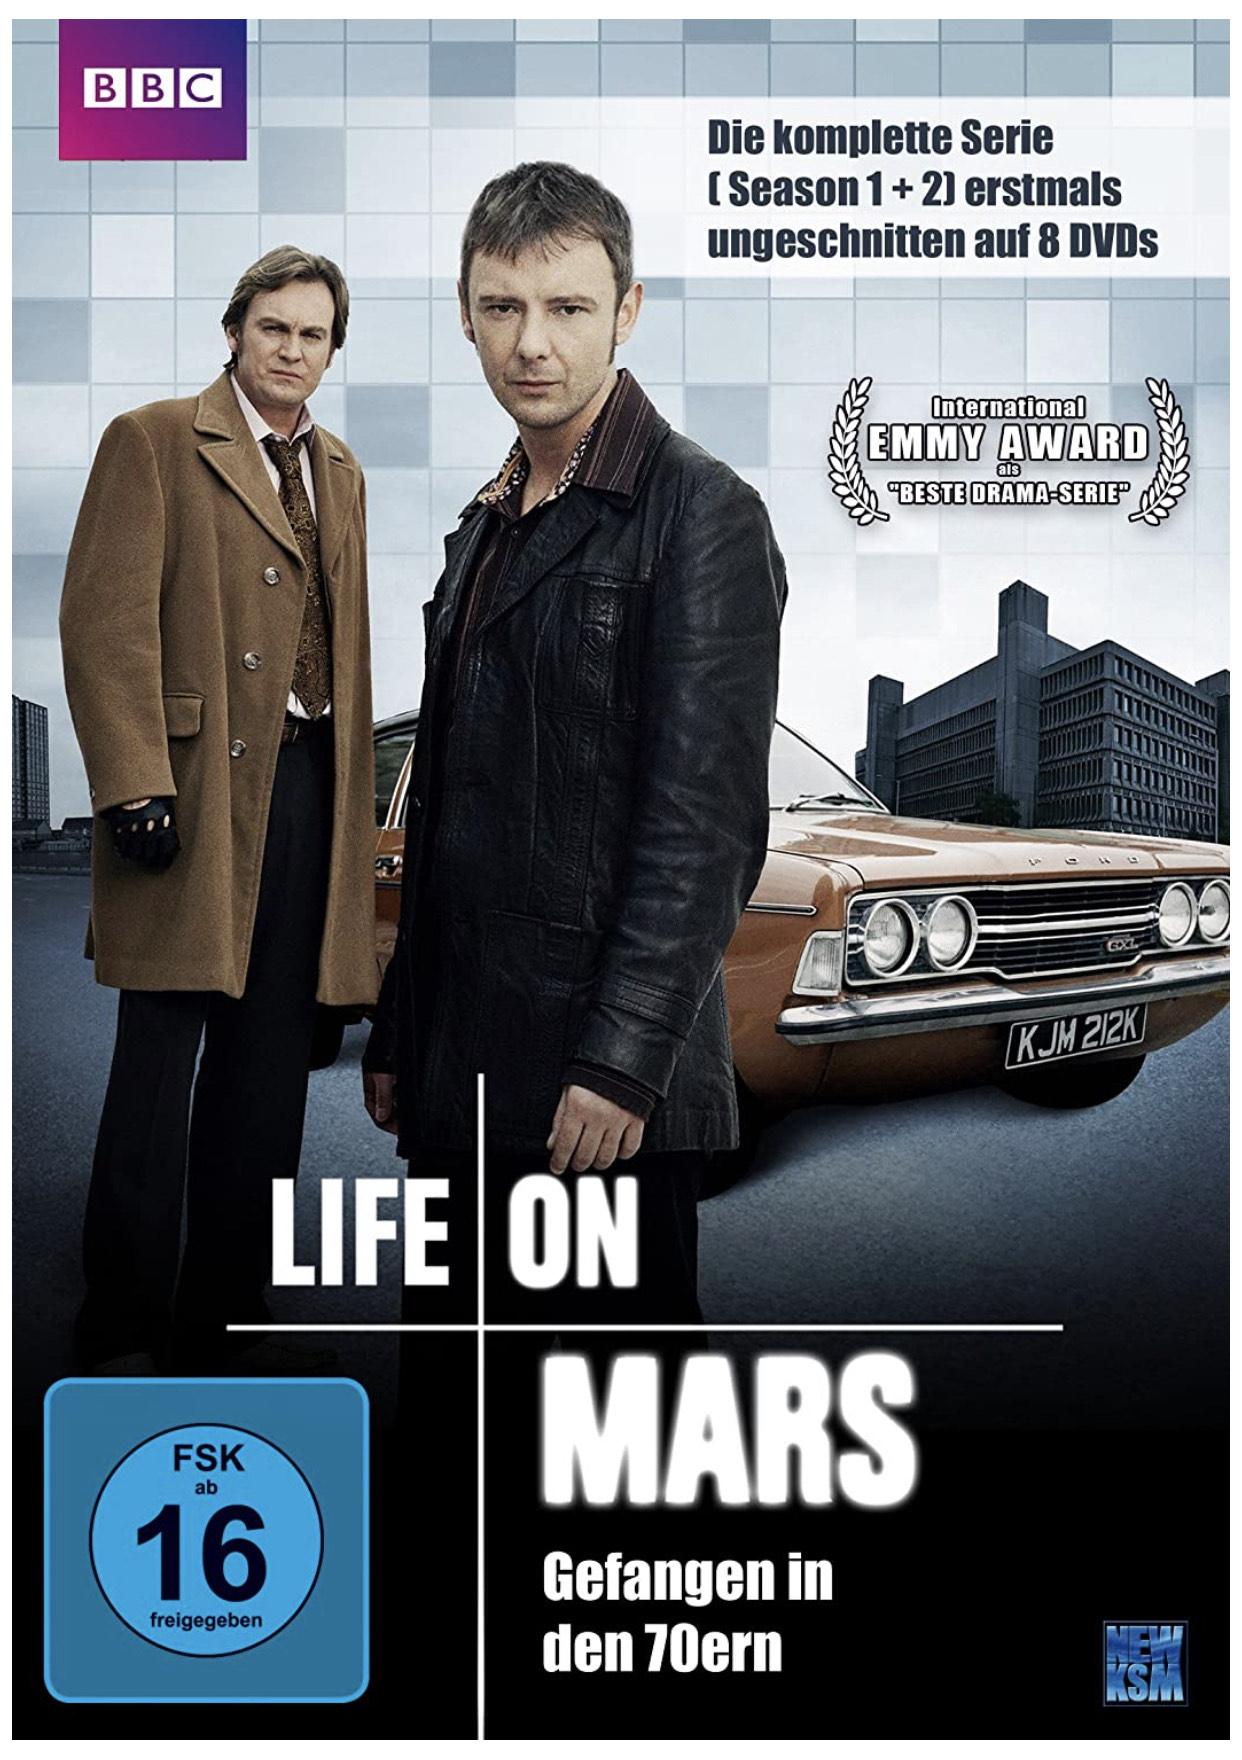 [Prime] BBC: Life on Mars - Gefangen in den 70ern - Die komplette Serie [Uncut   DVD]